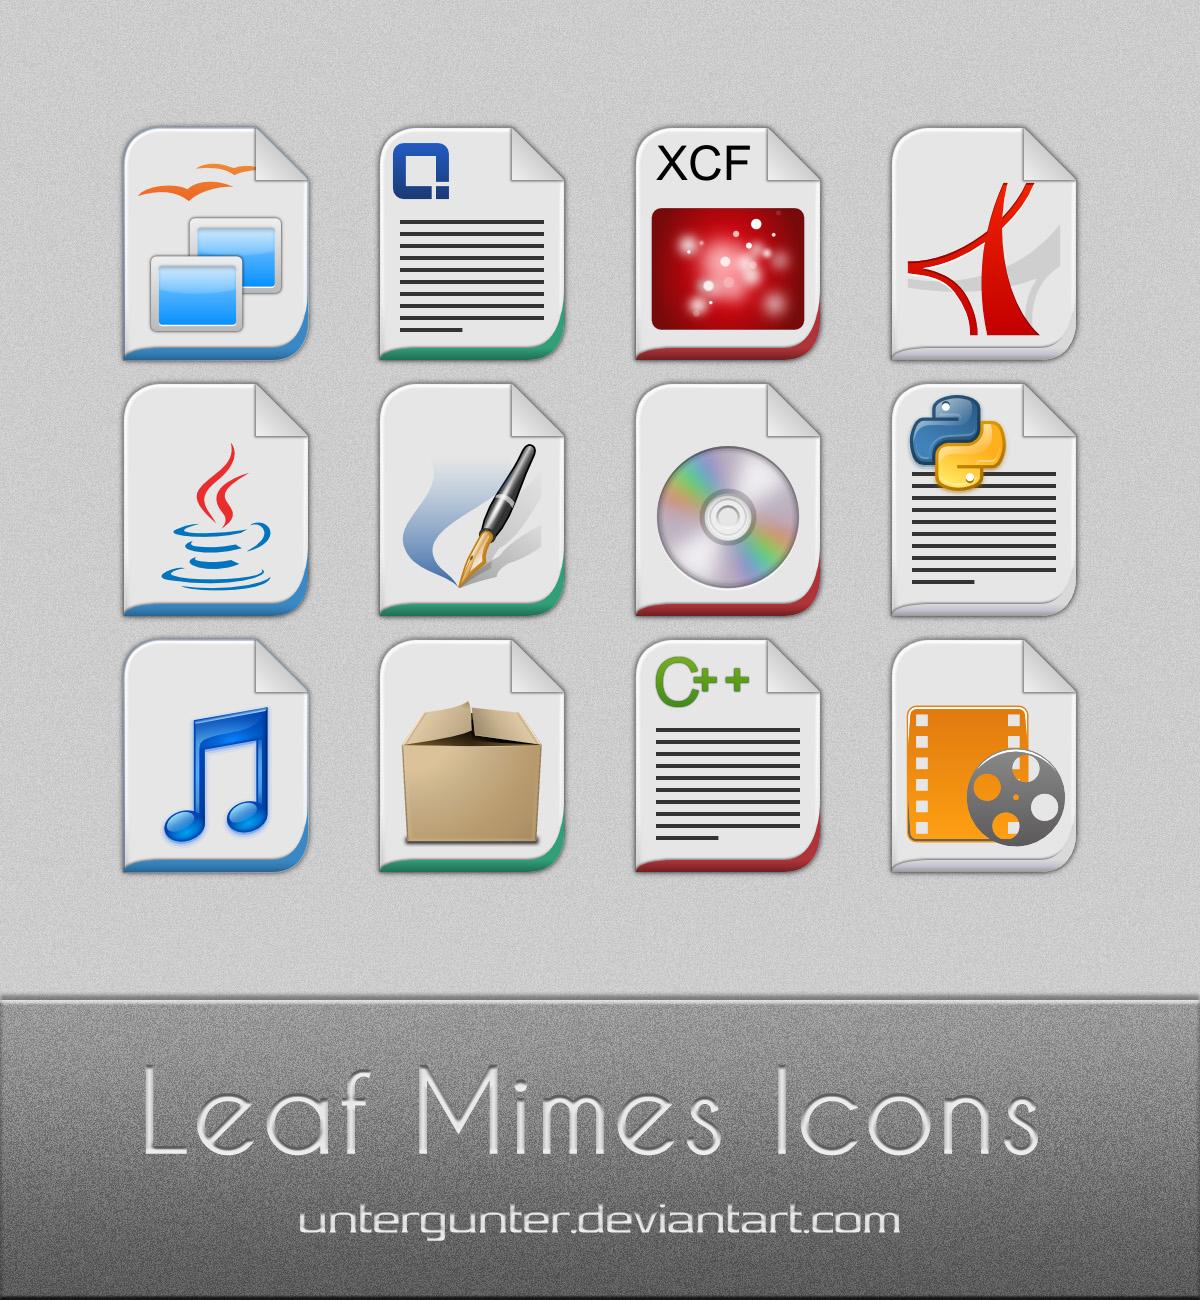 Leaf Mimes Icons